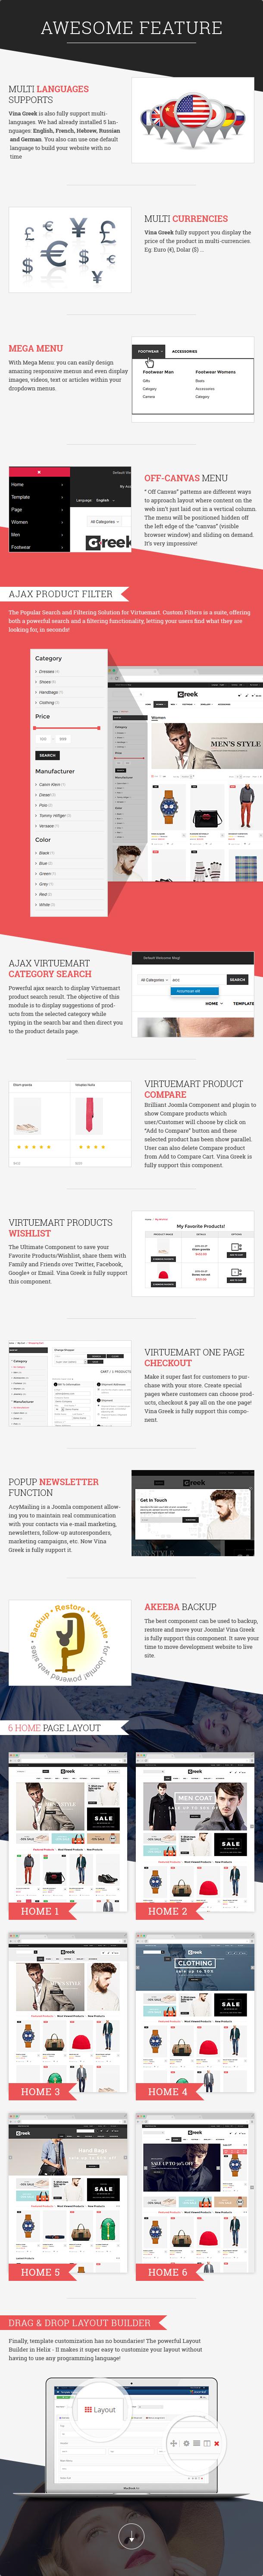 Vina Greek - Fashion VirtueMart 3 Template - 7